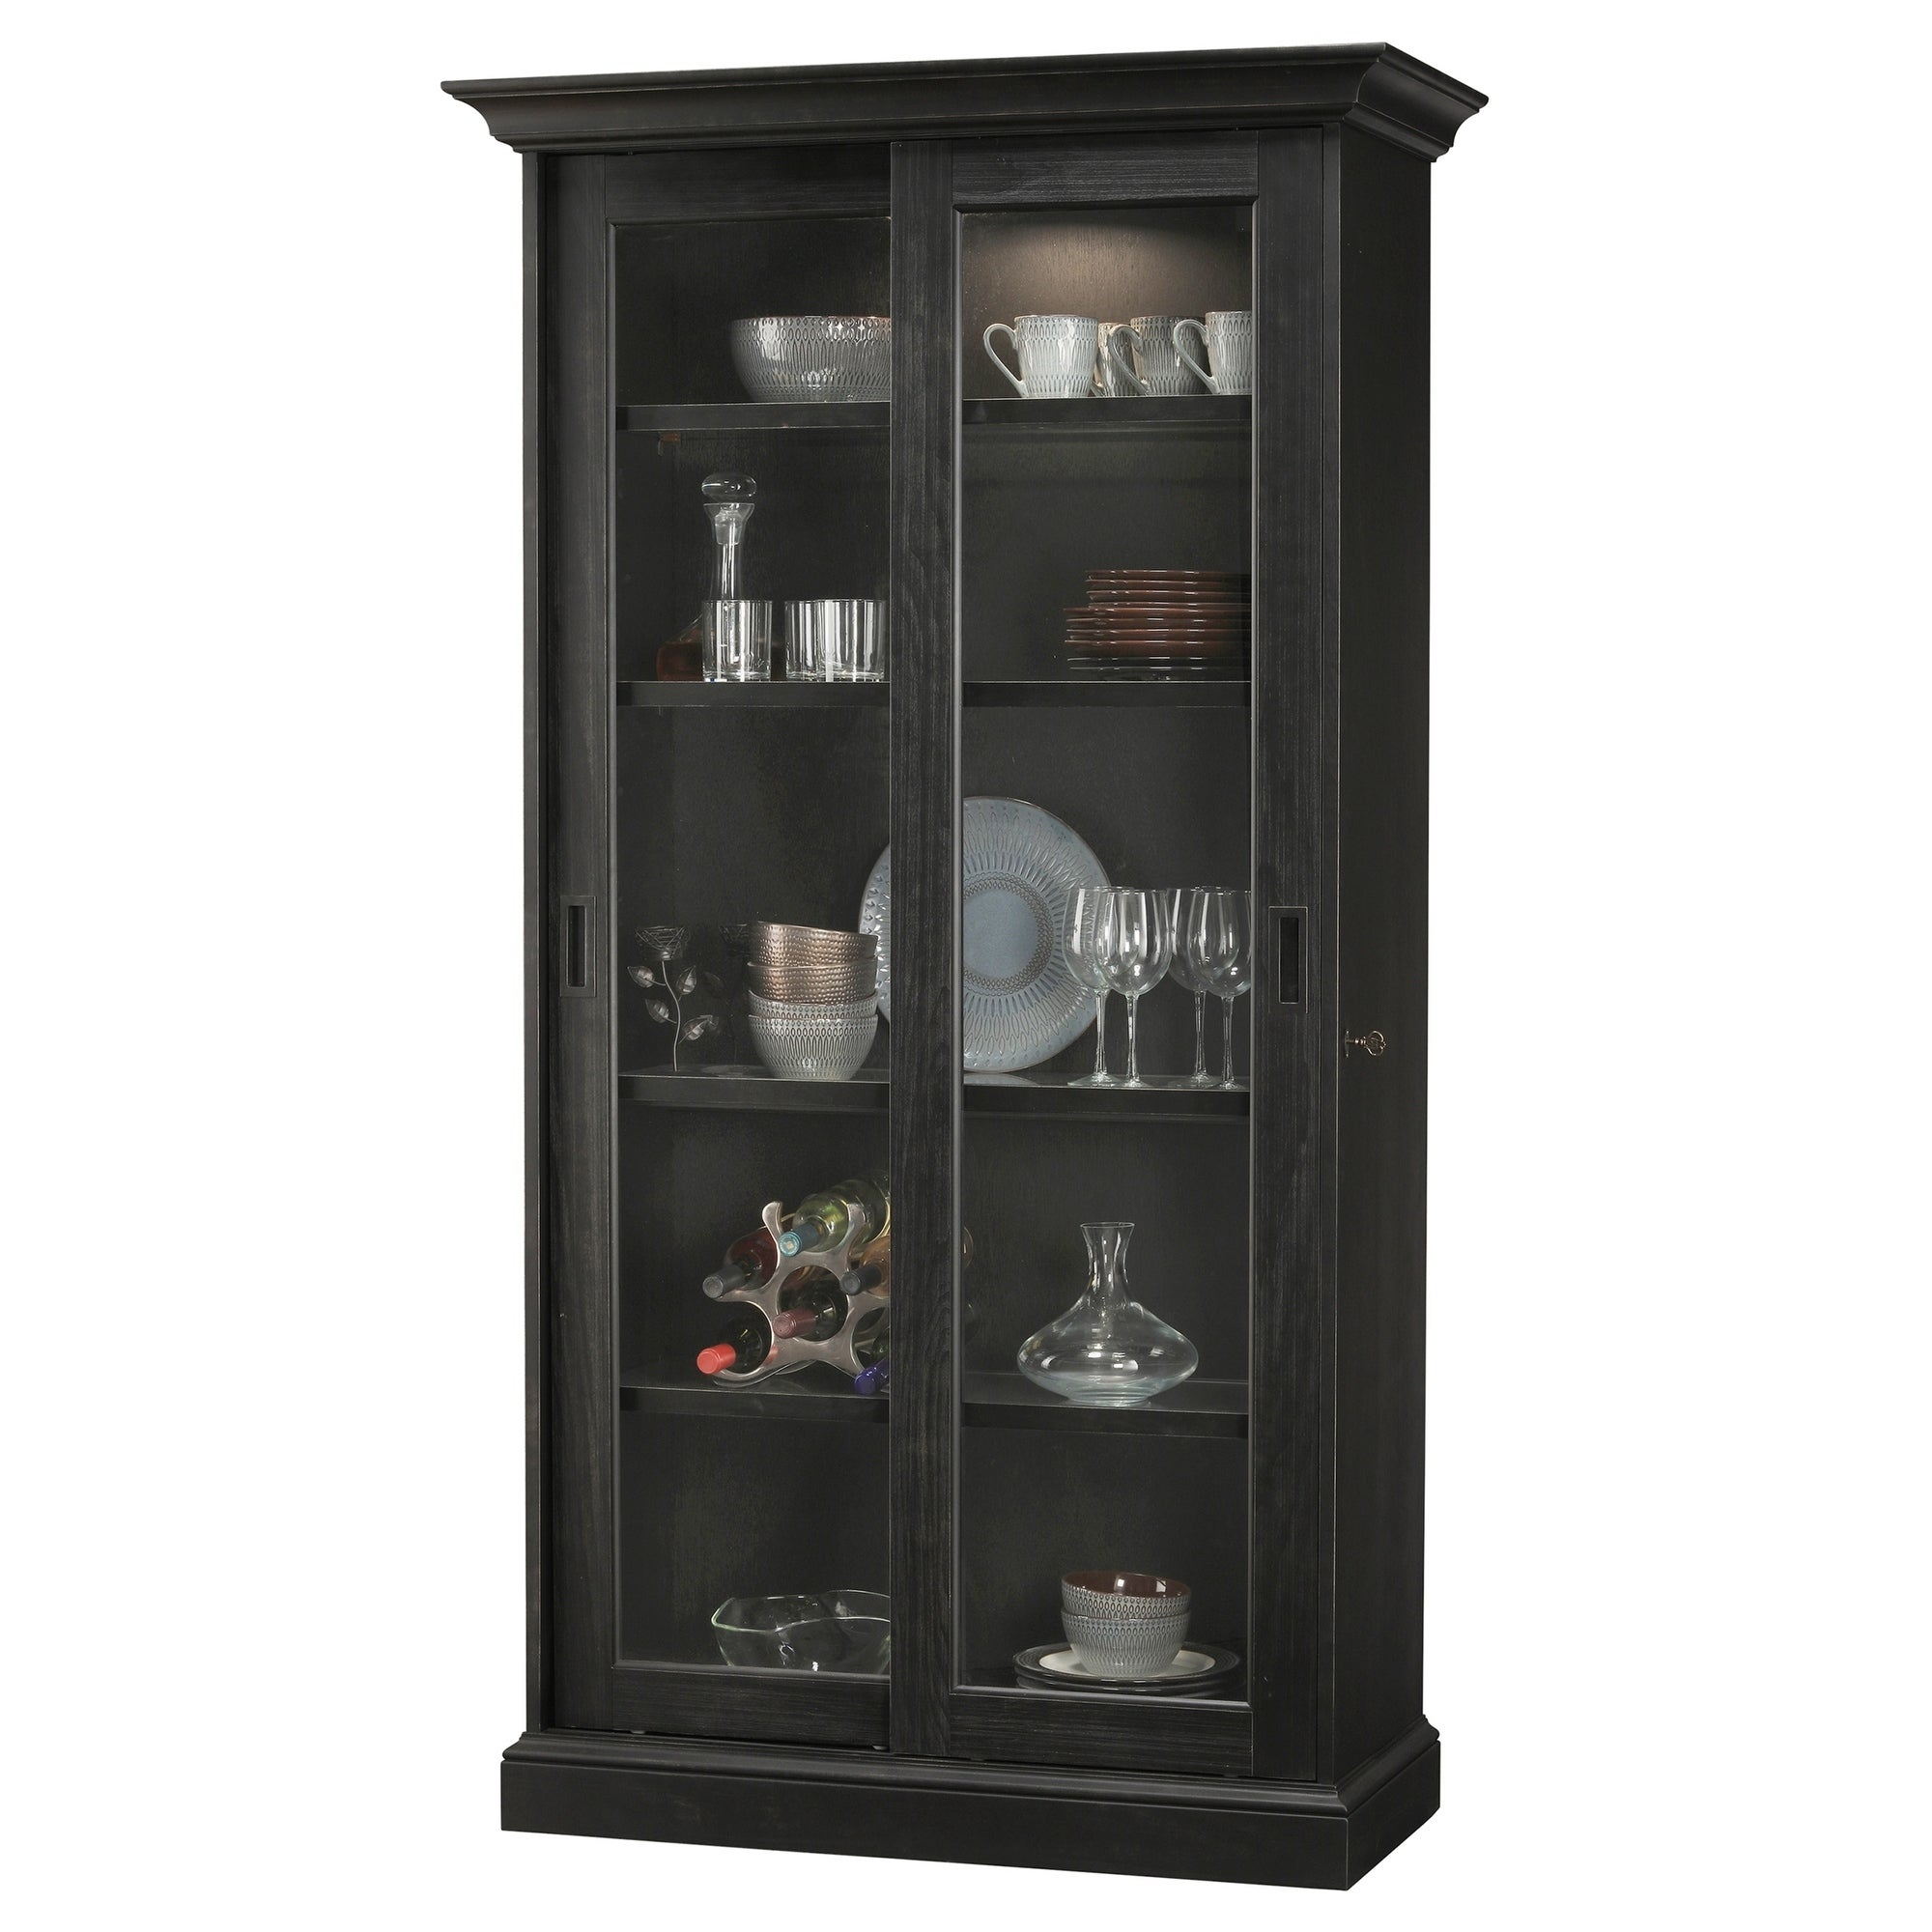 Howard Miller Meisha IV Aged Black Wood Tall 5-shelf Living Room Curio  Cabinet with Slider Doors